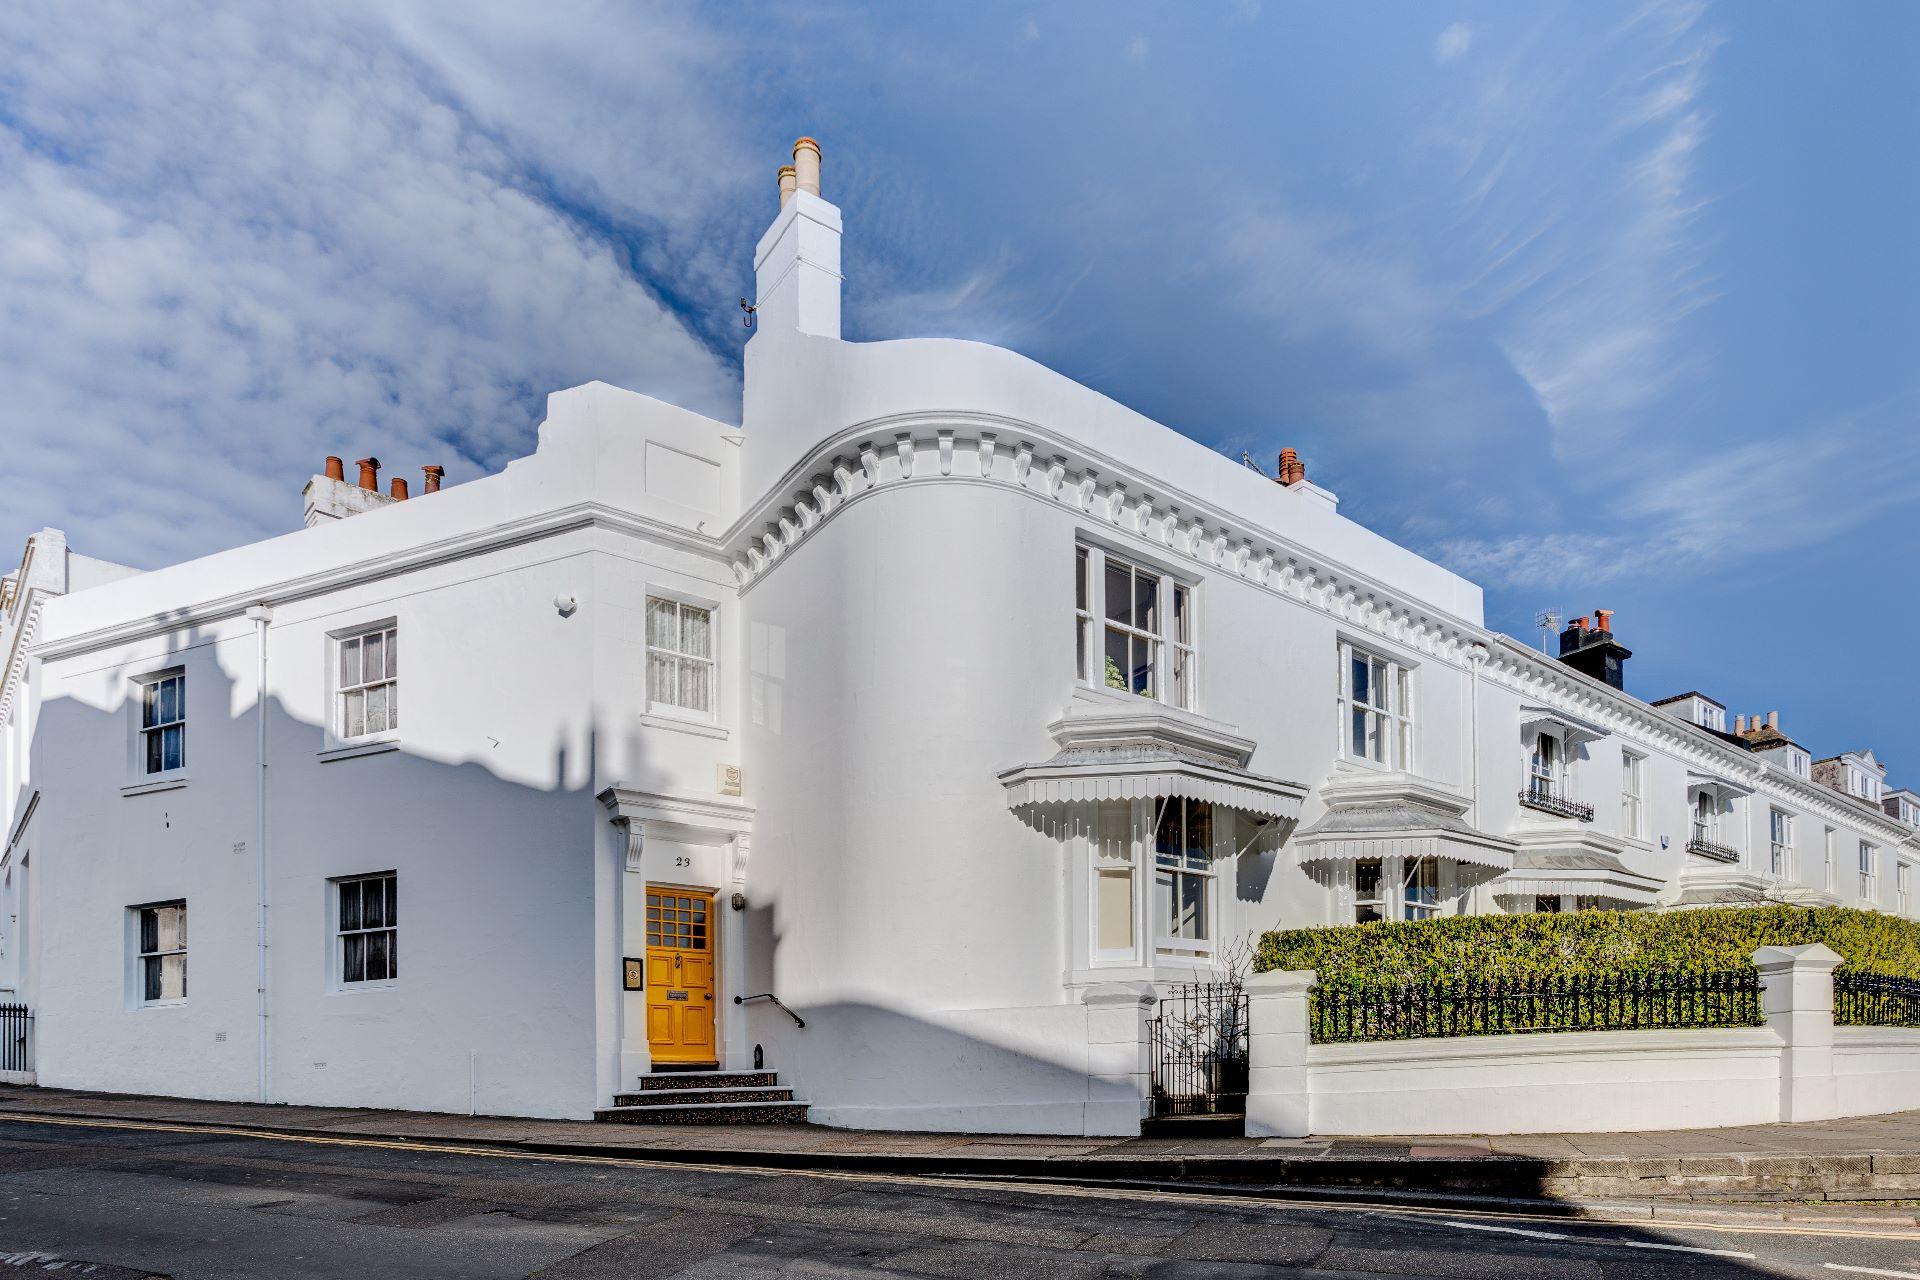 Clifton Terrace, Clifton Hill Conservation, Brighton